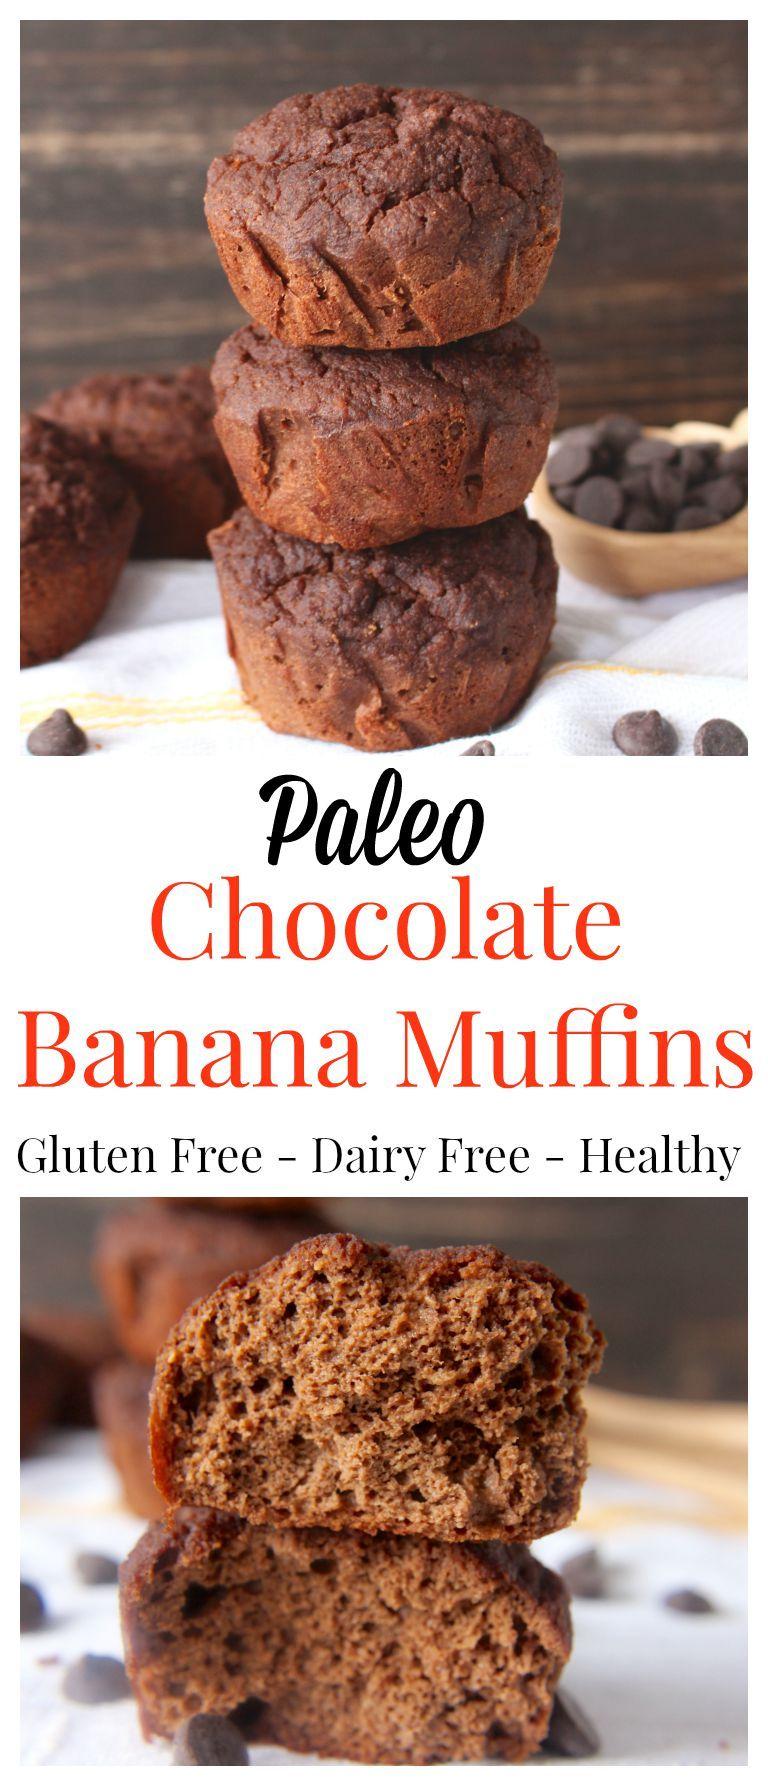 Recetas de chocolate dieta paleolitica